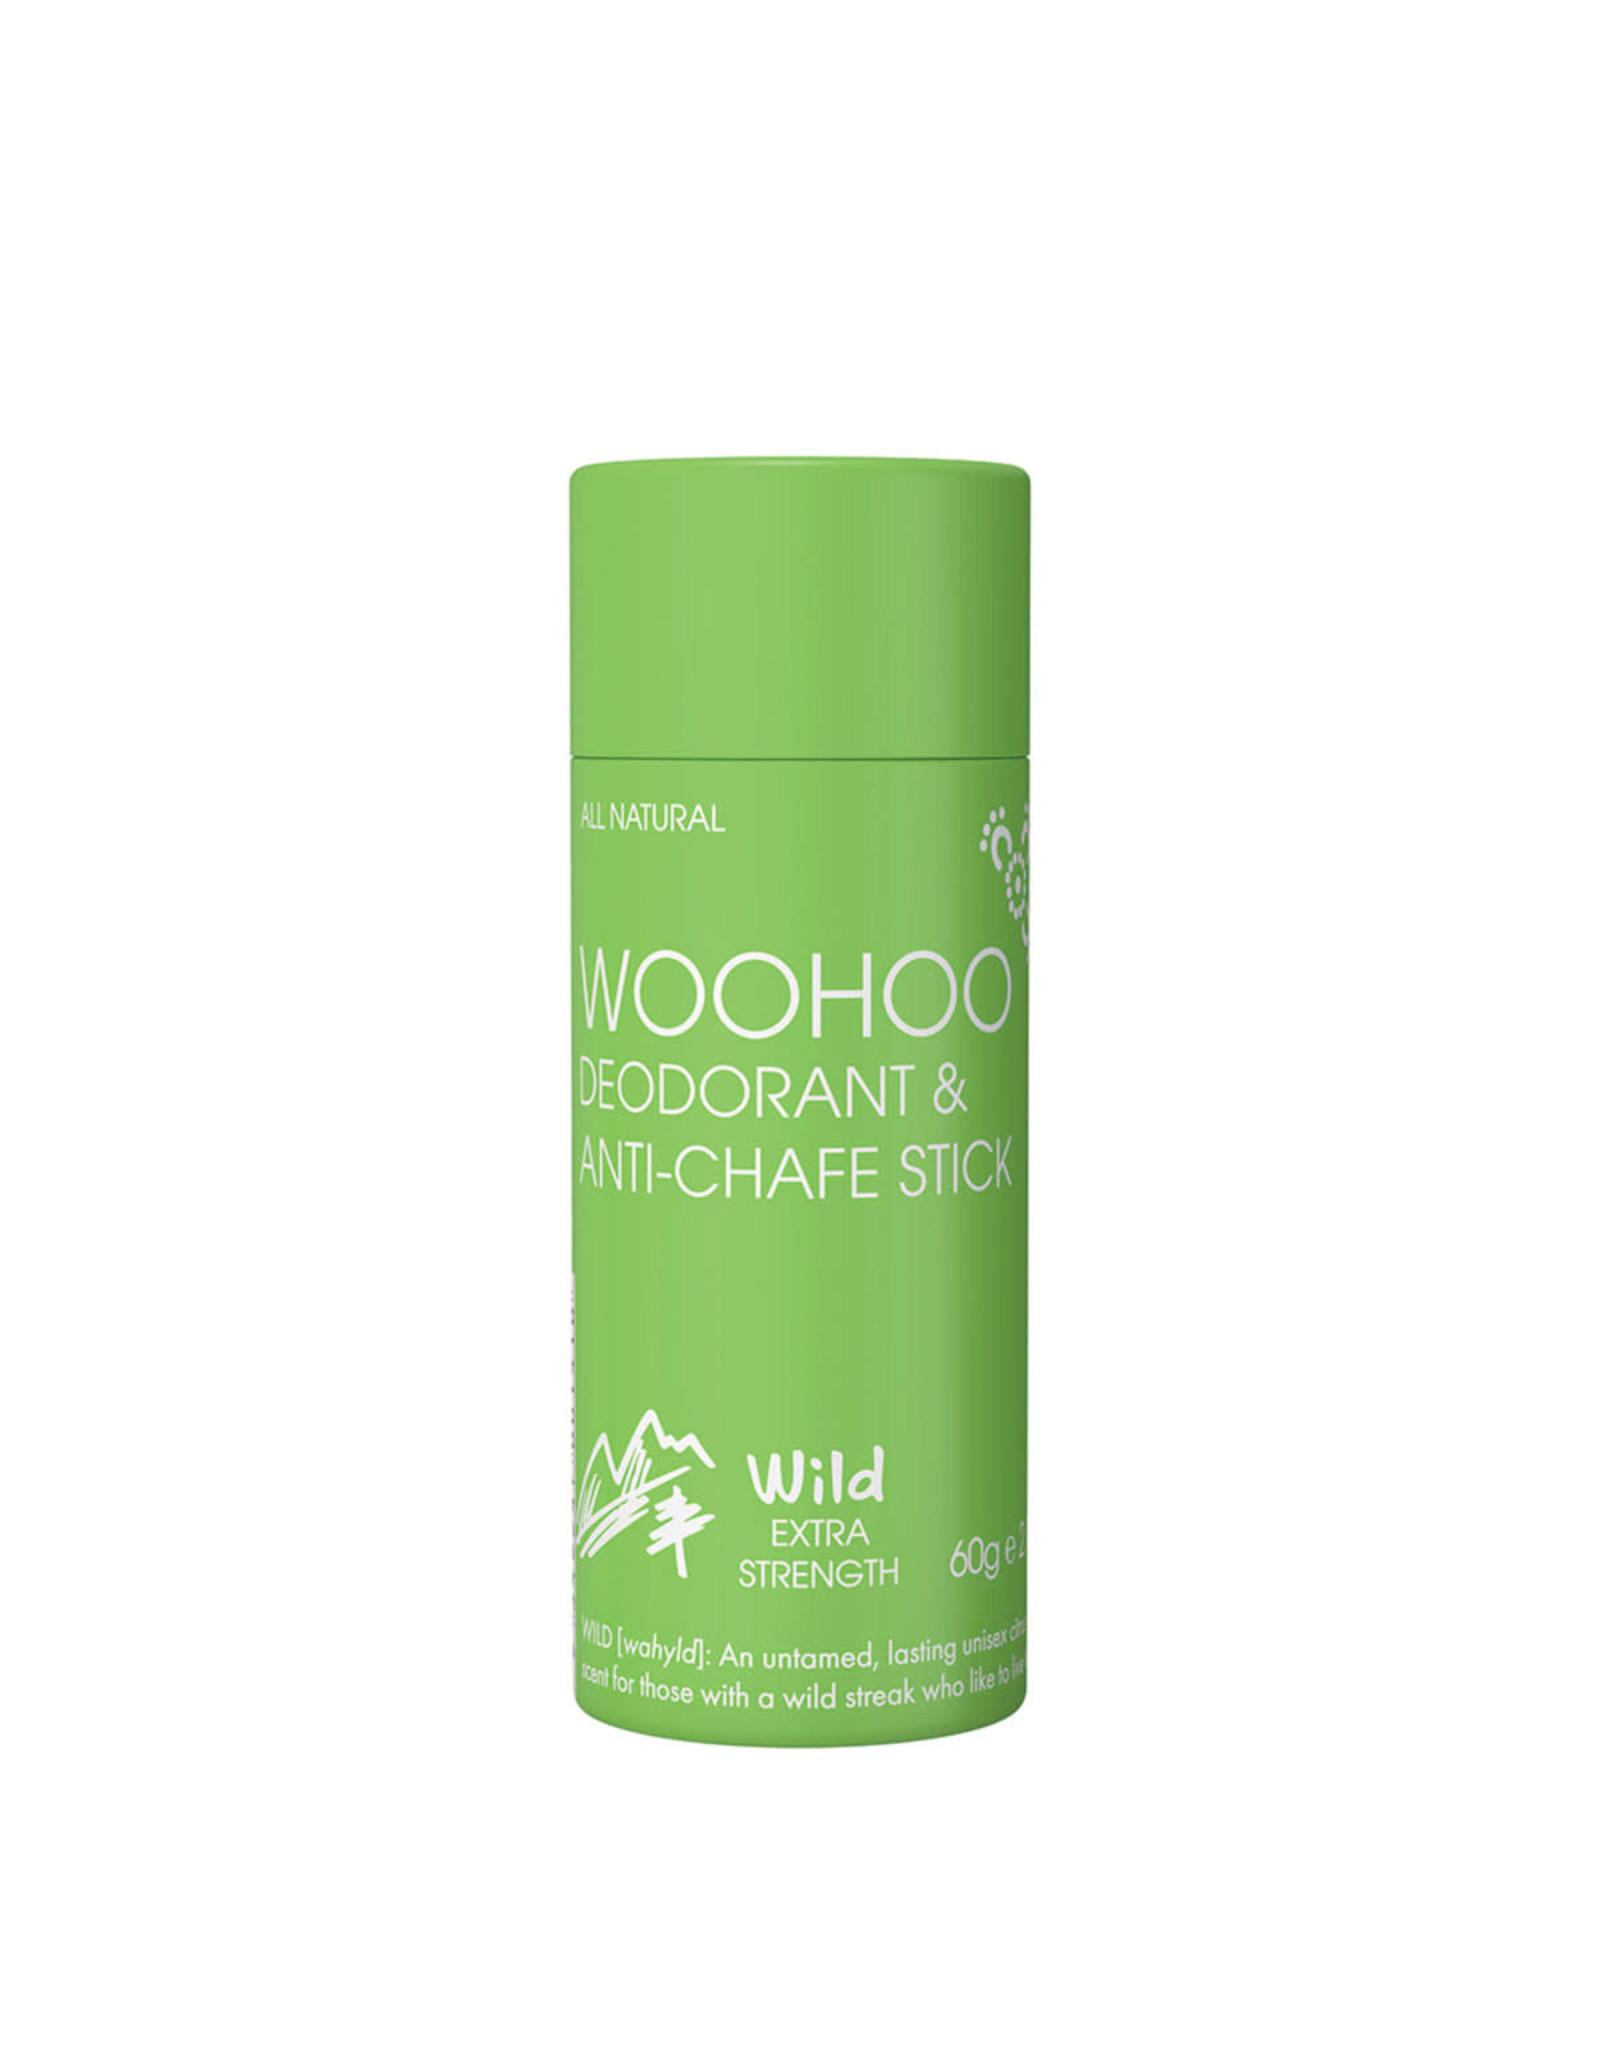 Woohoo Deodorant & Anti-Chafing Stick 60g - Wild